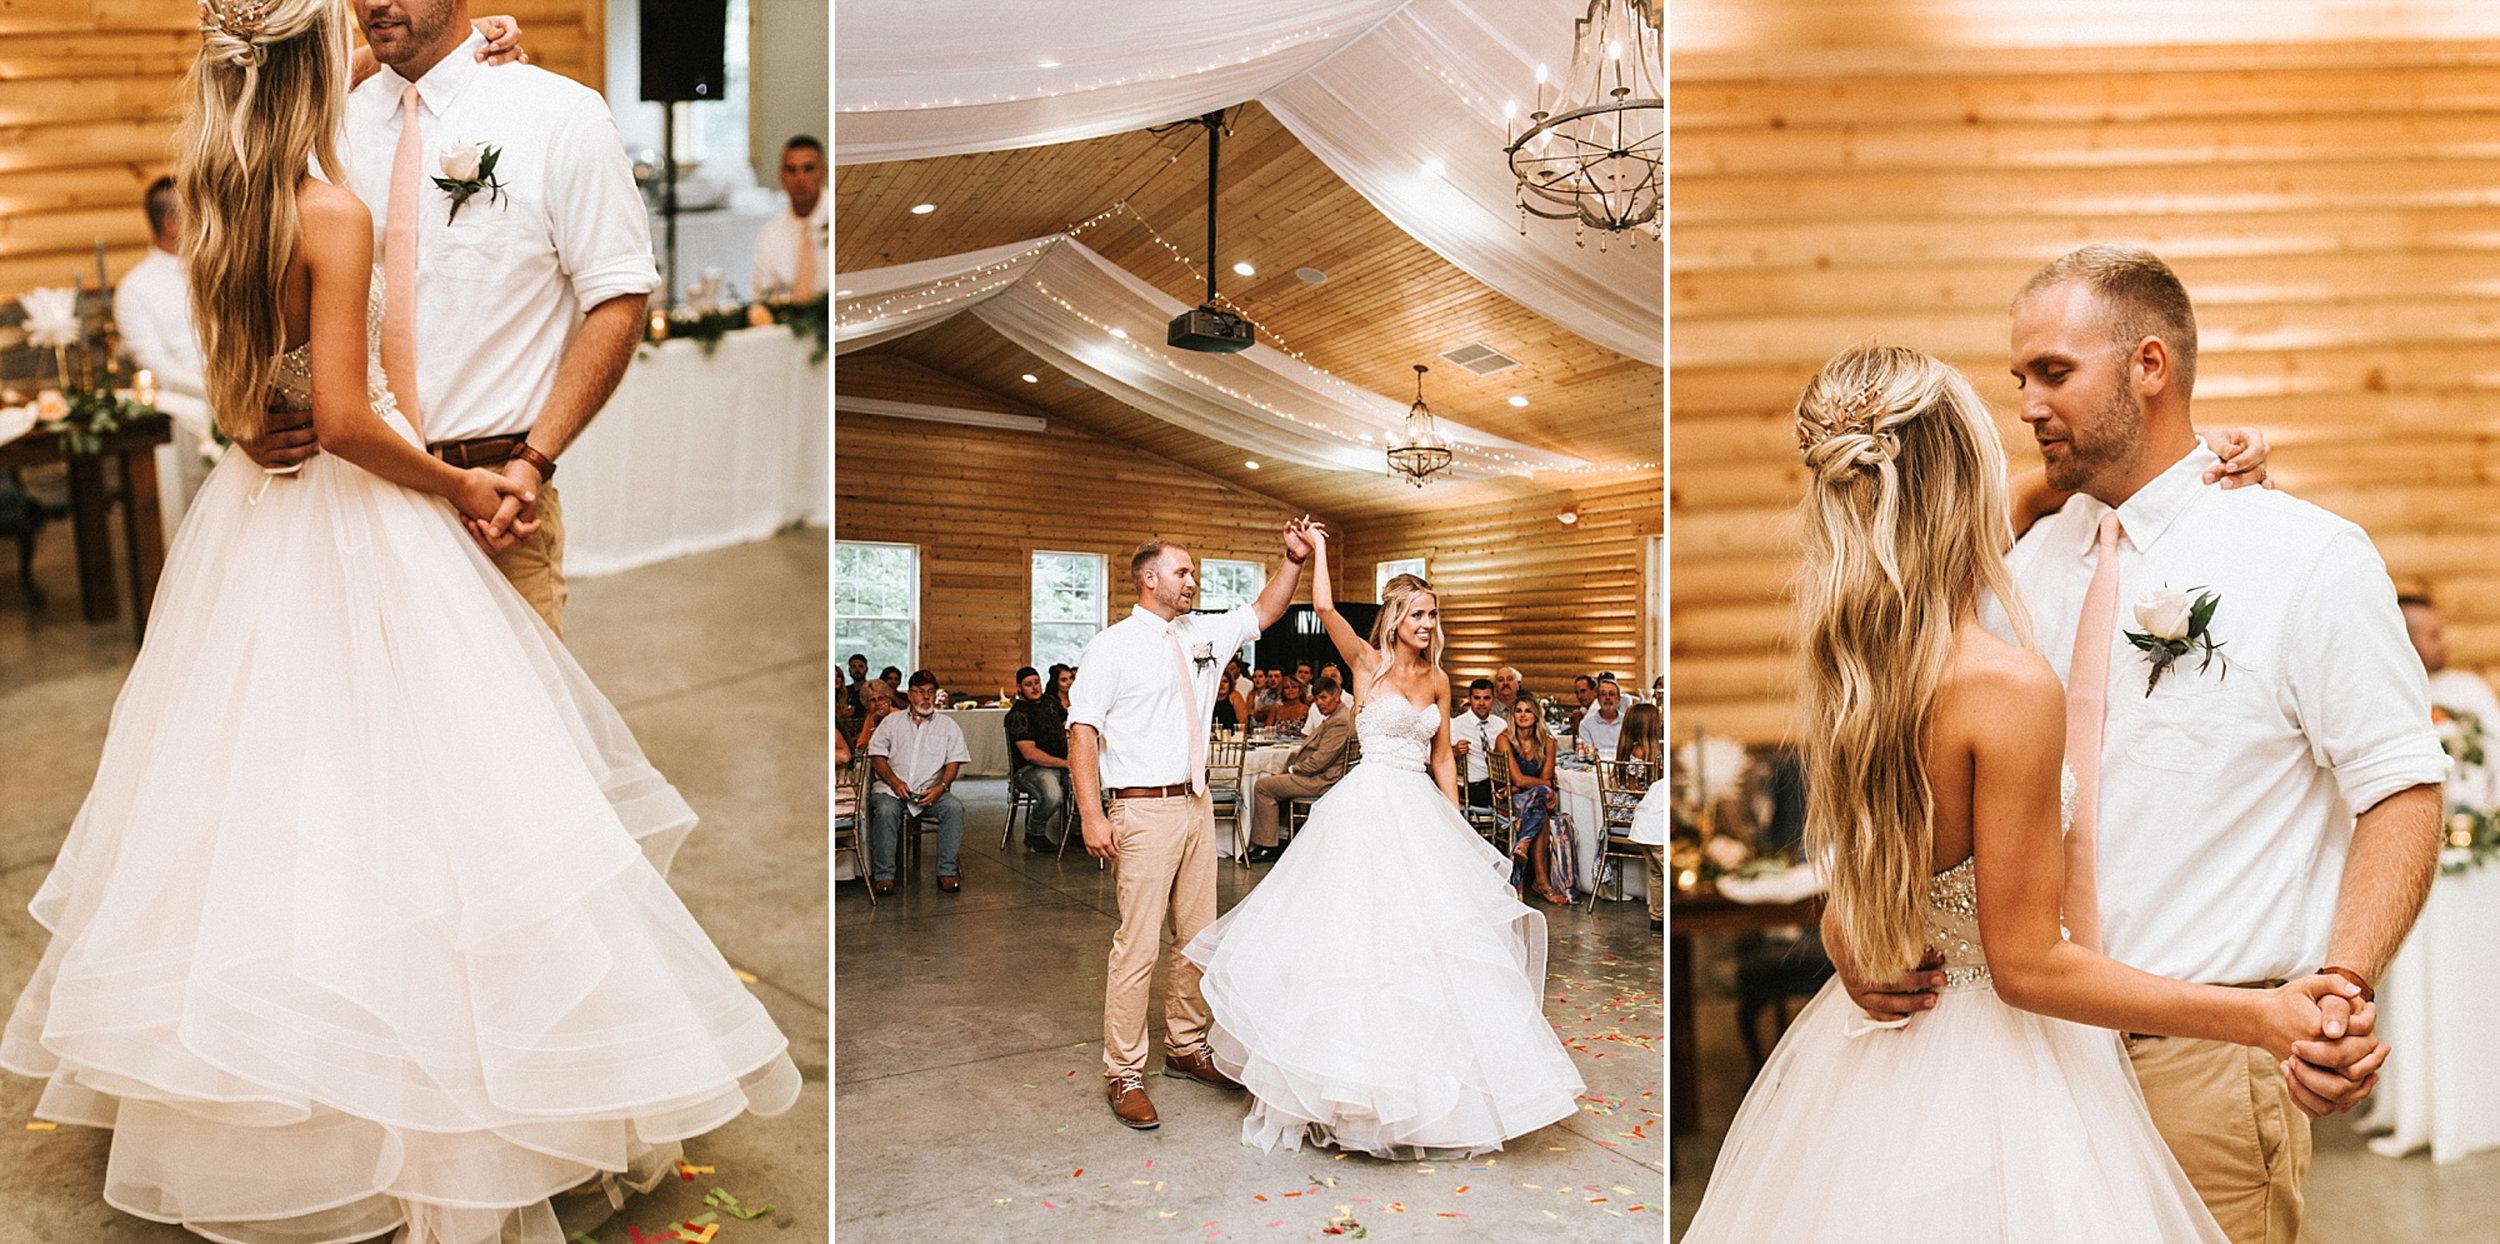 Brooke Townsend Photography - Cincinnati Wedding Photographer (131 of 153).jpg